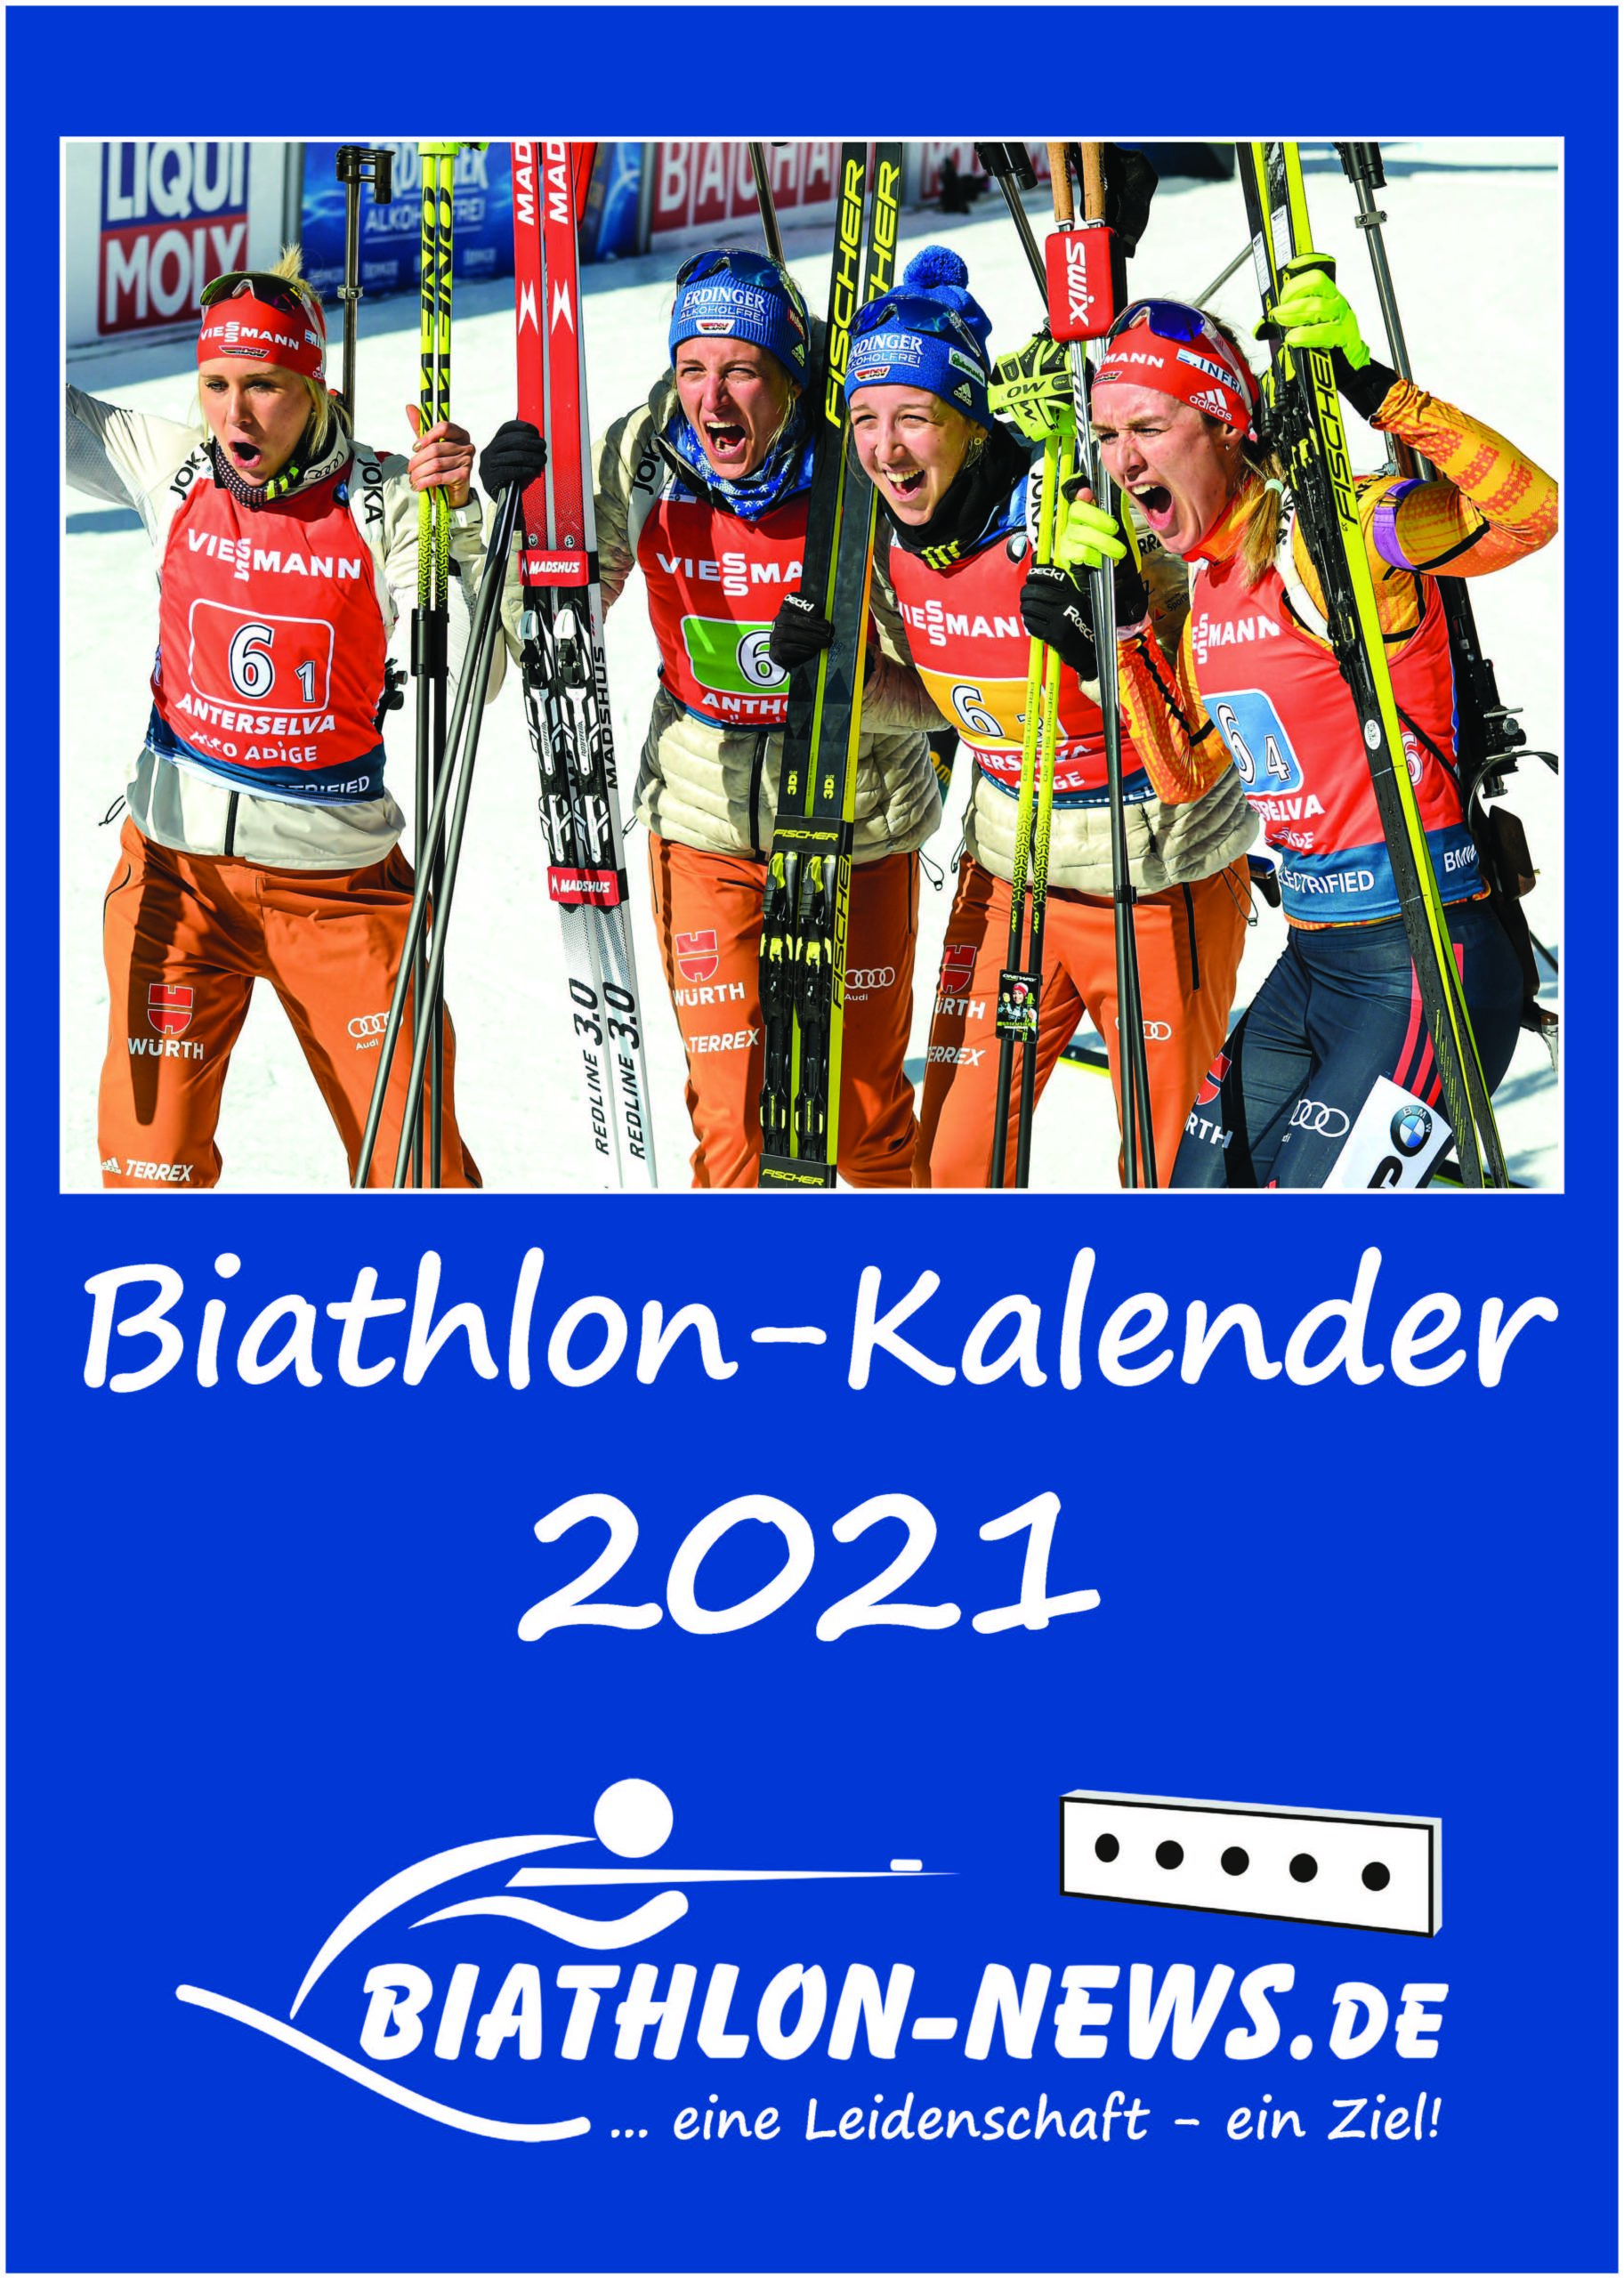 Biathlonkalender